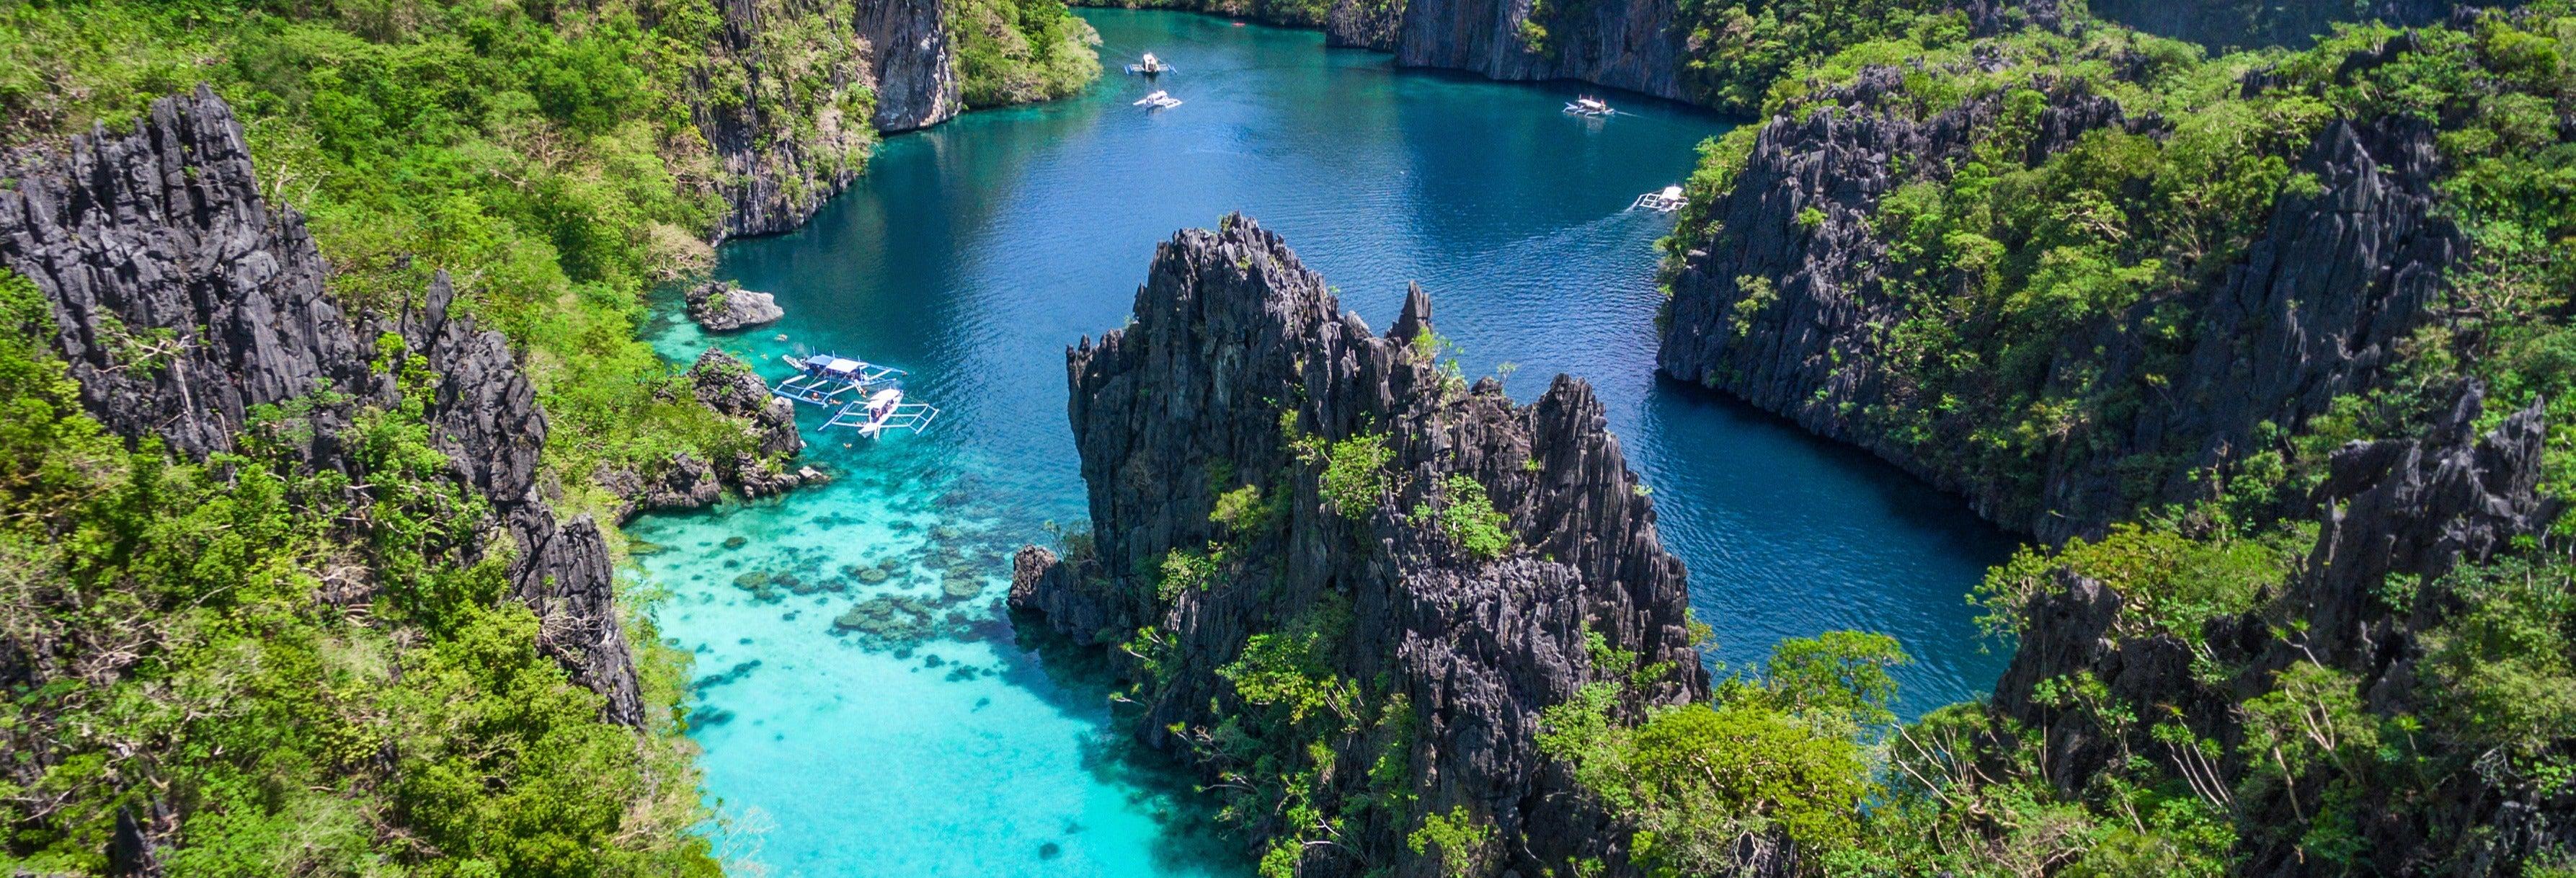 Tour de 10 dias por Palawan para mochileiros